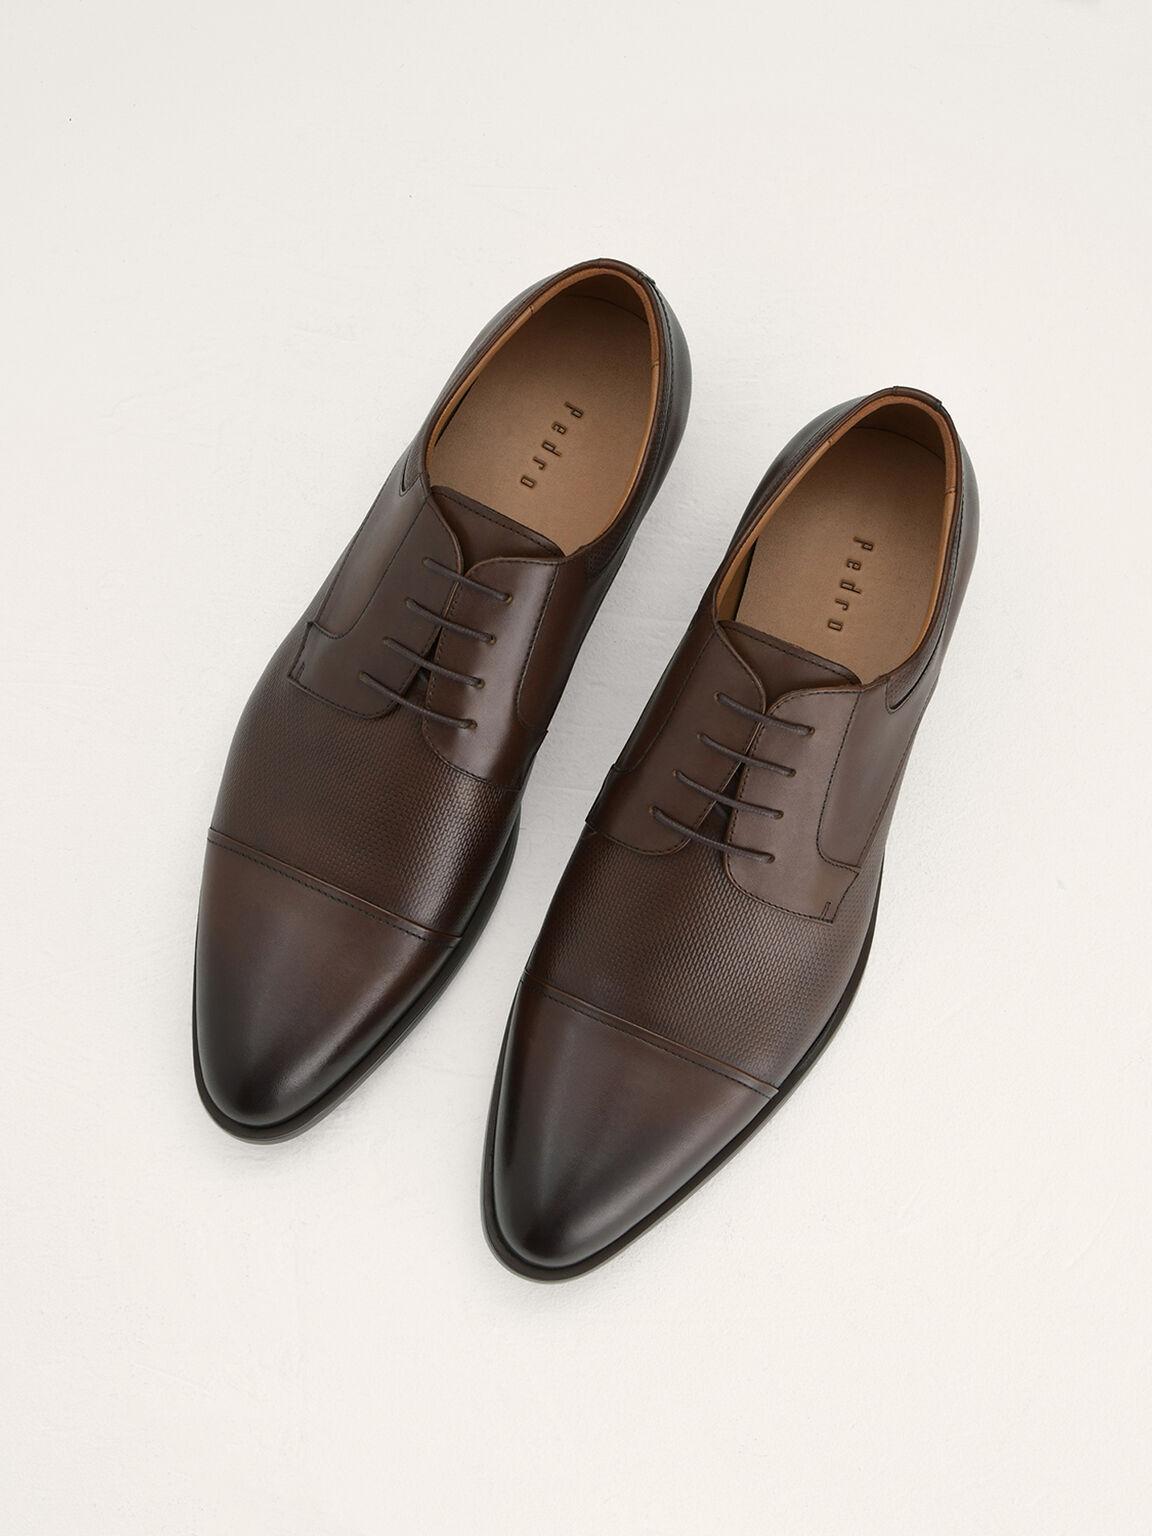 Leather Derby Shoes, Dark Brown, hi-res